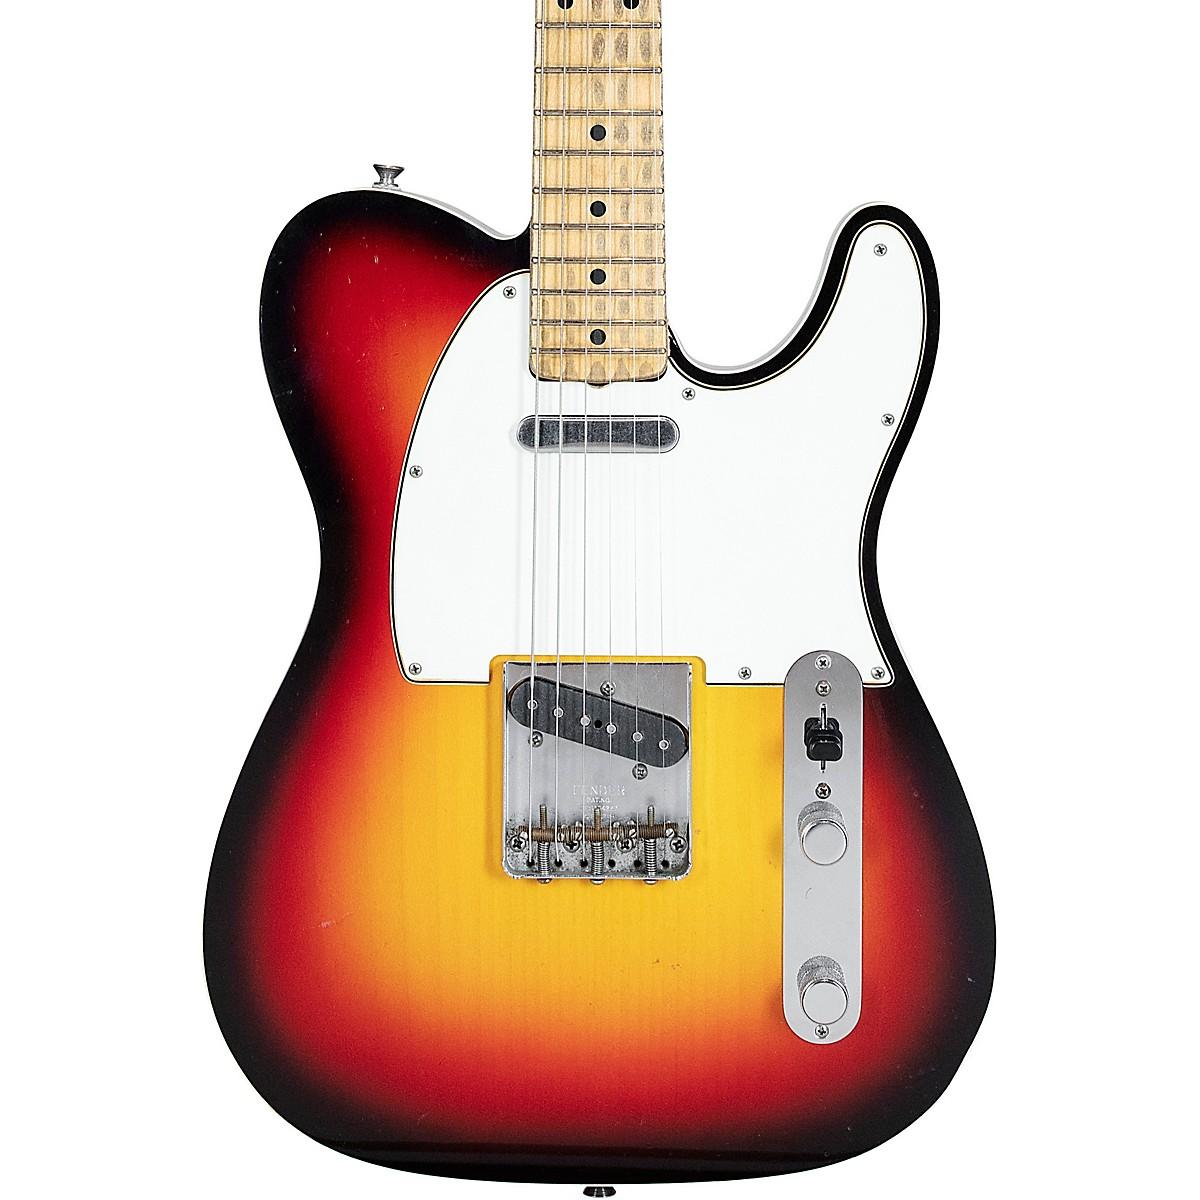 Fender Custom Shop Eric Clapton Crossroads Blind Faith Telecaster Electric Guitar by Todd Krause